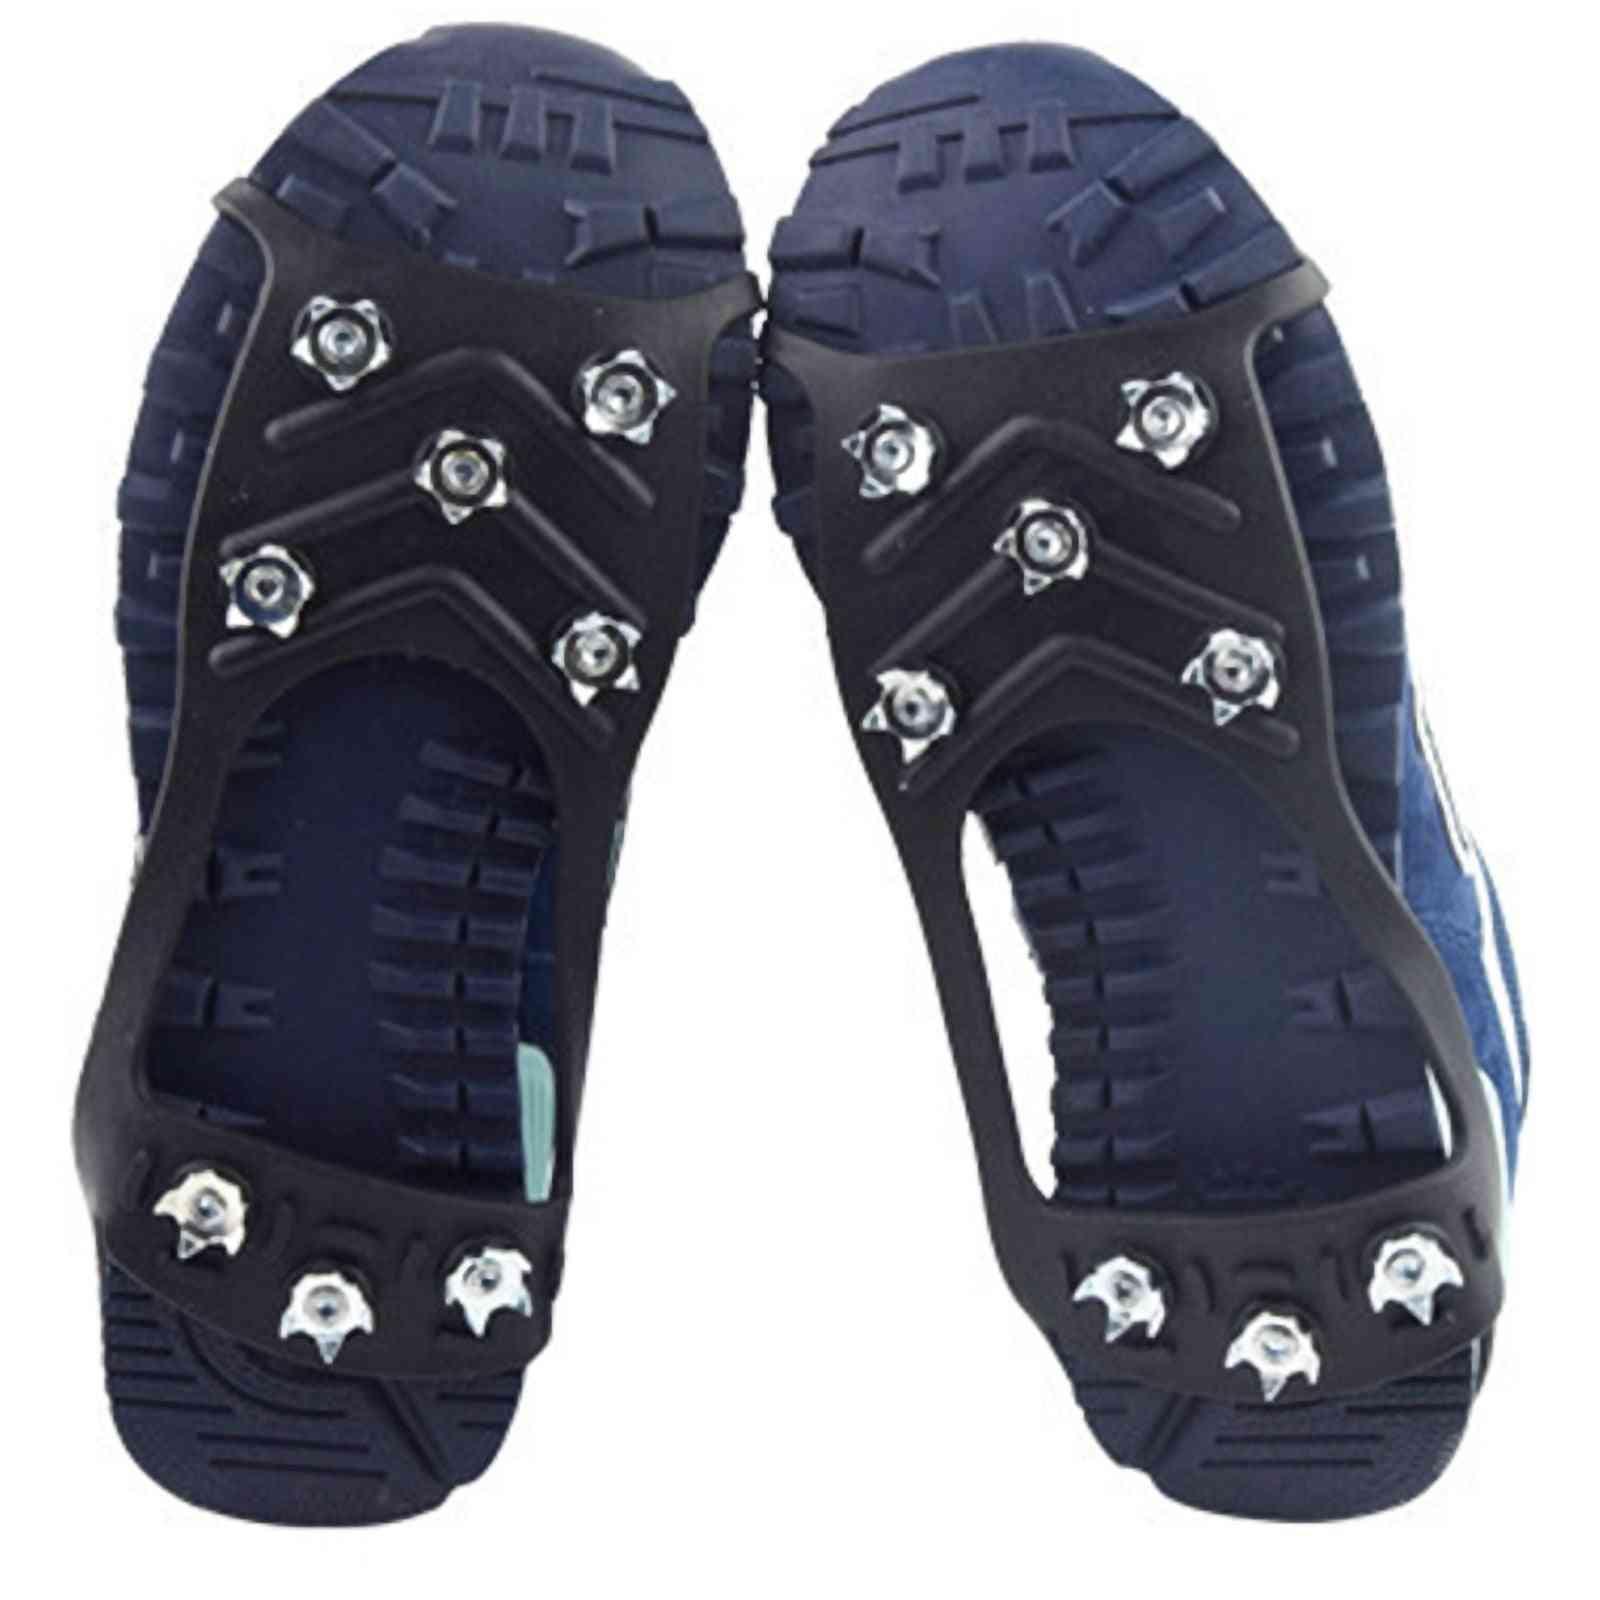 Anti-skid Spikes Crampon Anti-ice On Shoes Slip Grips